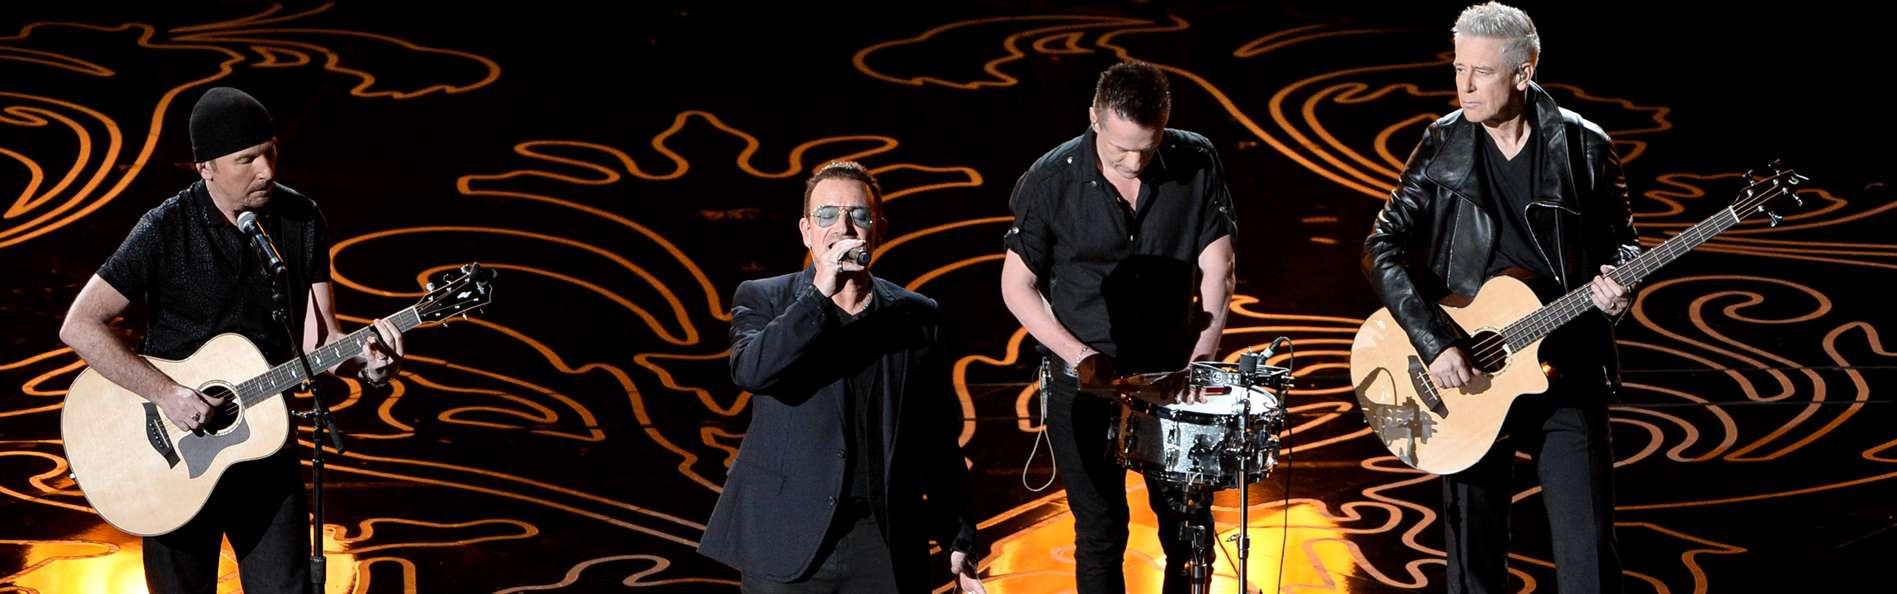 U2. Foto: Getty Images